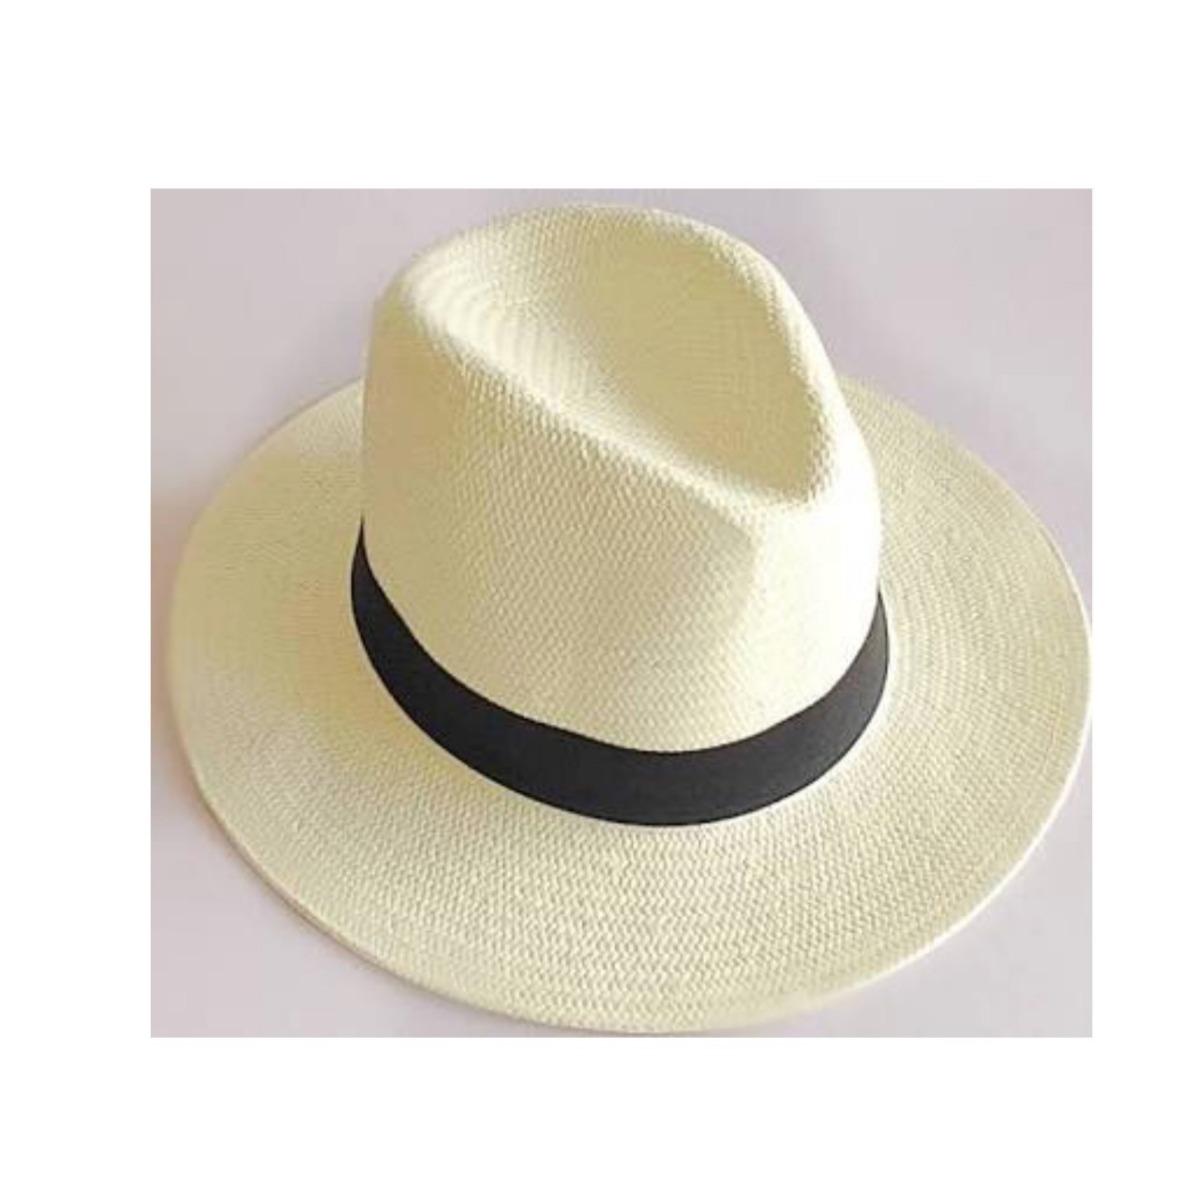 f162cc83d467f Carregando zoom... chapéu aba longa moda panamá clássico casual praia  unissex · chapéu moda panamá